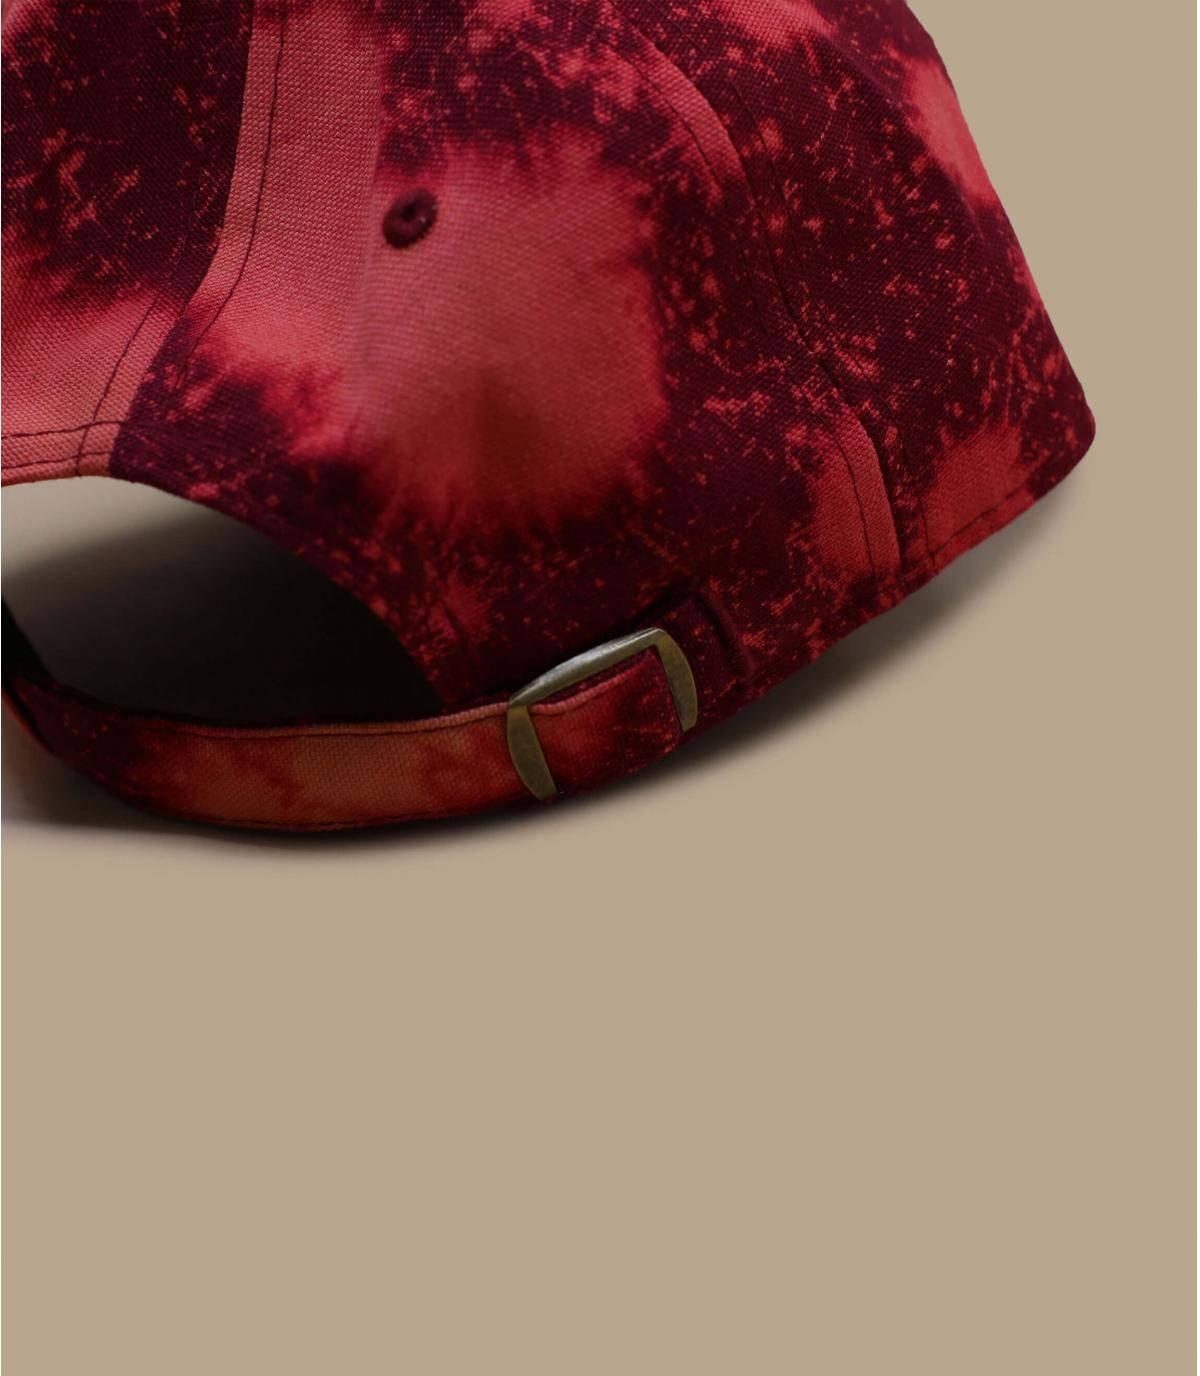 Détails Casquette Wash Canvas CSCL 920 NY hot red - image 4